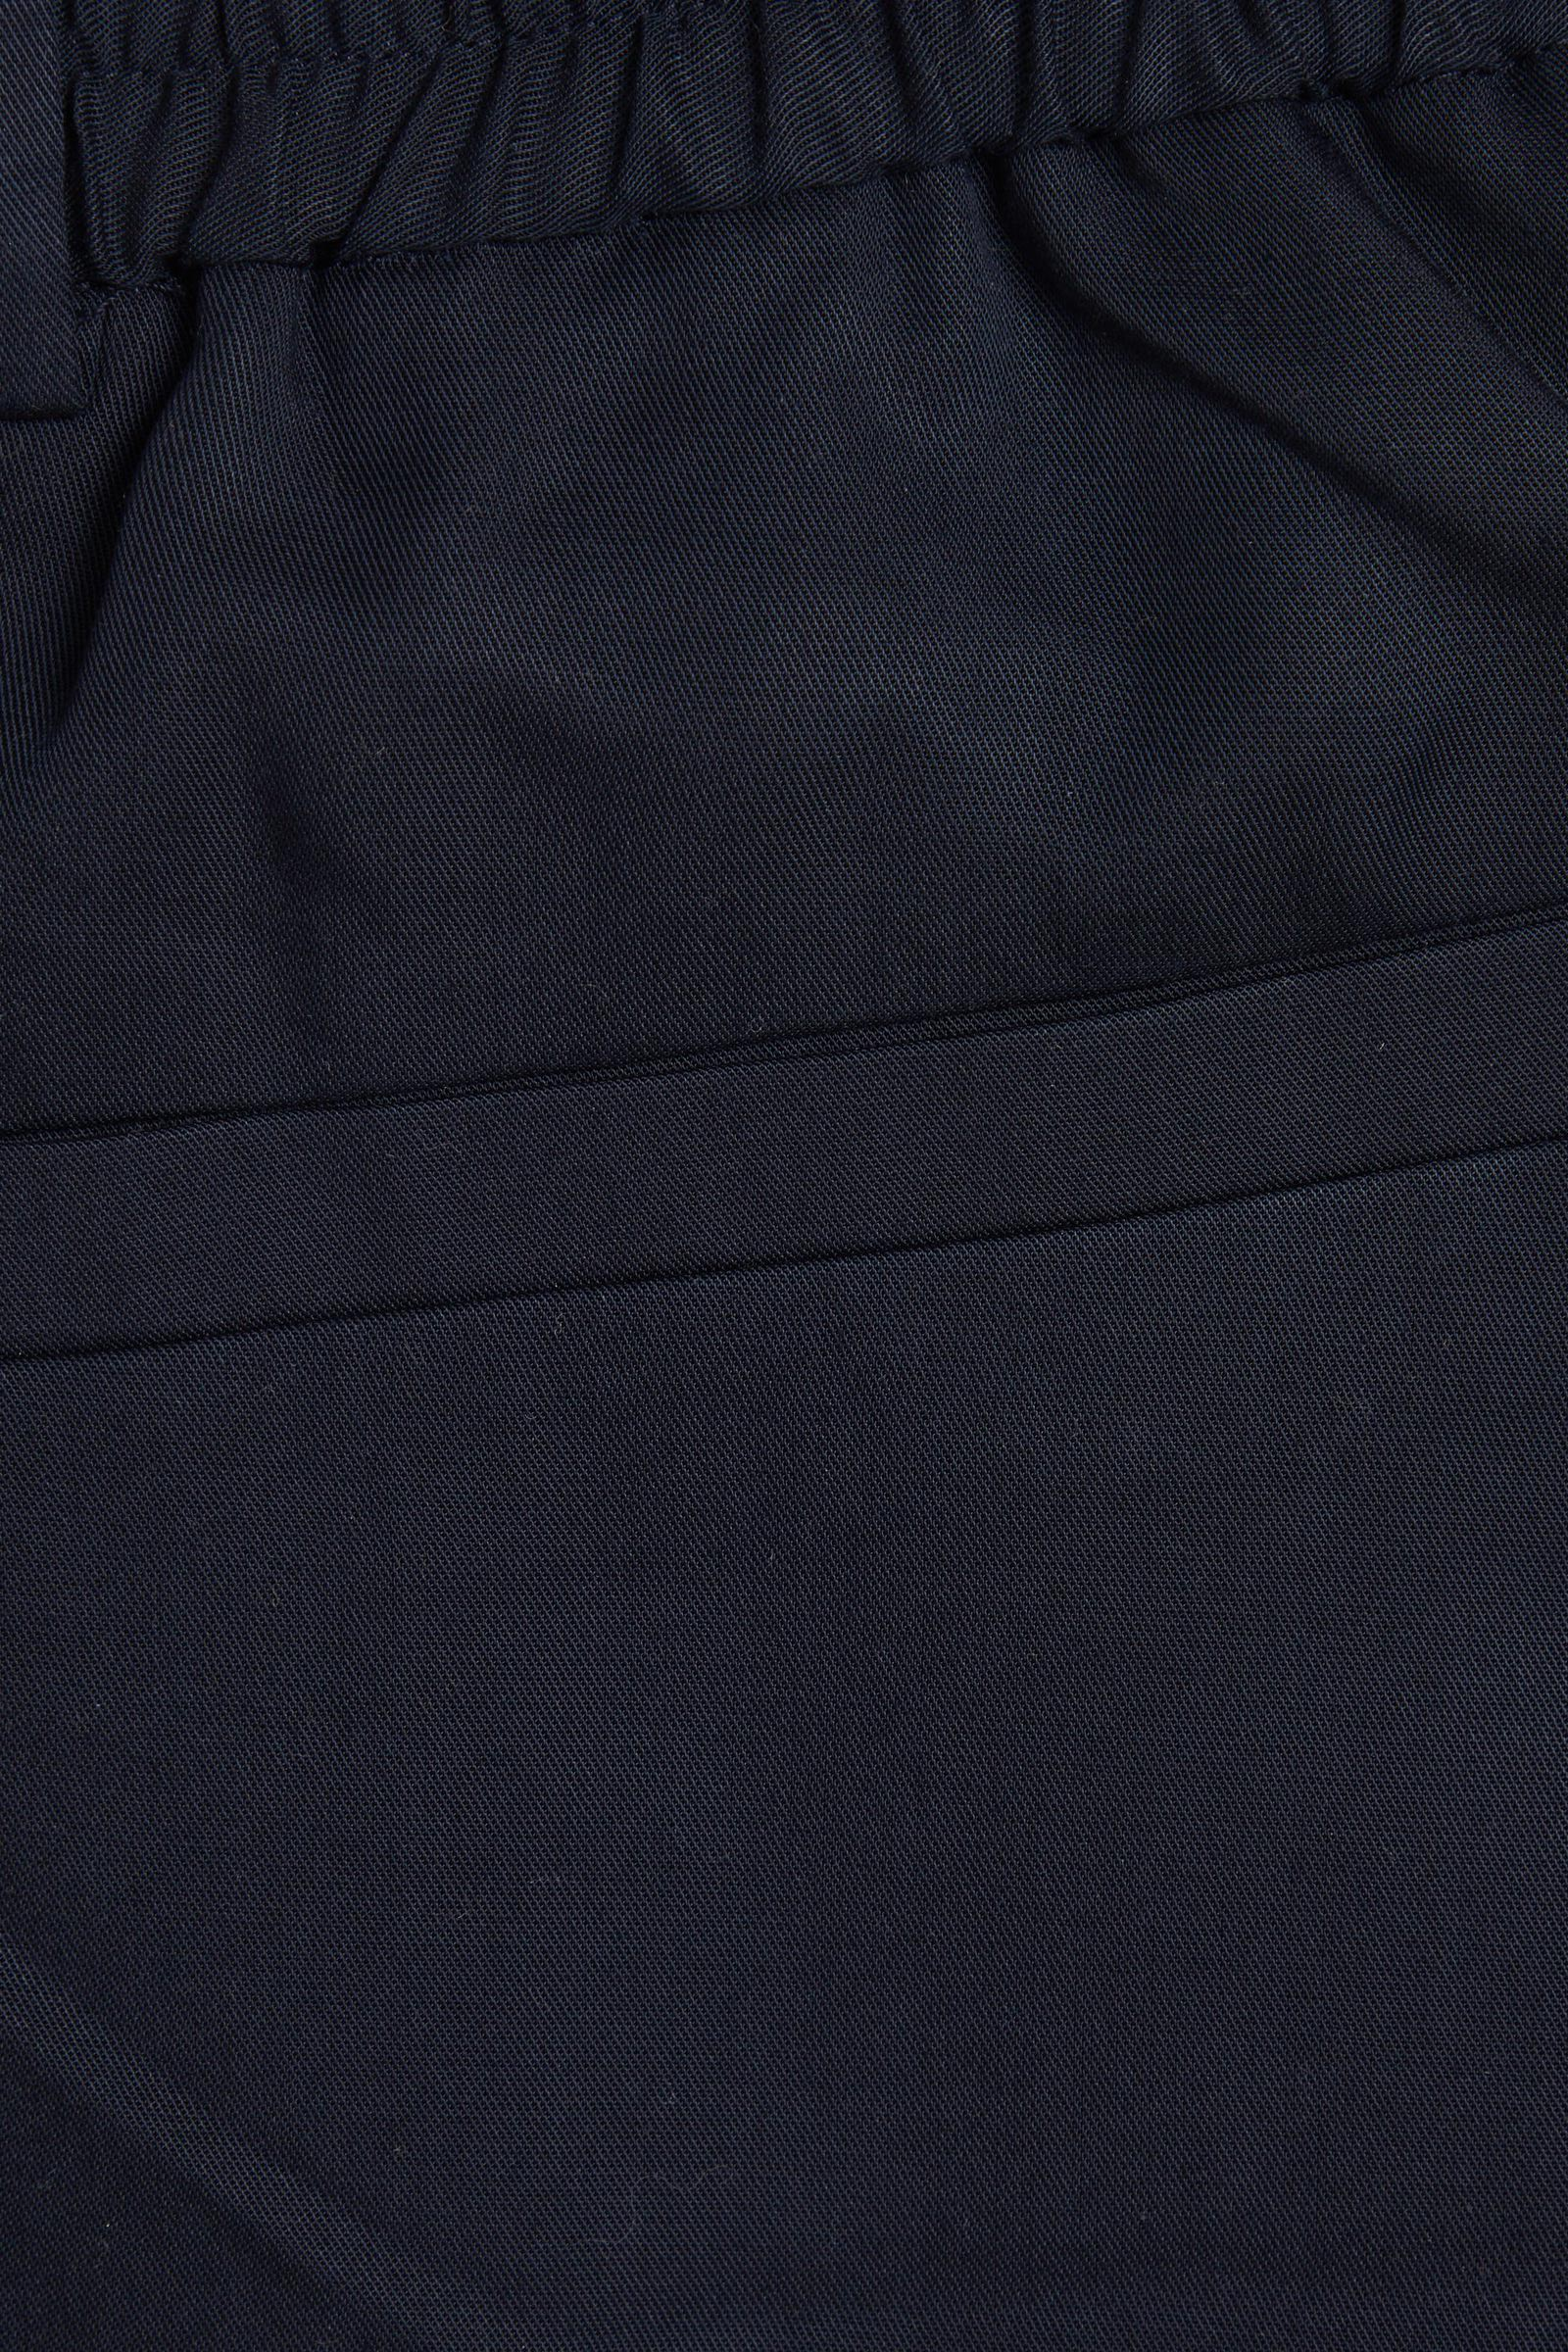 COS 라이오셀 롱 캔버스 쇼츠의 블랙컬러 Detail입니다.